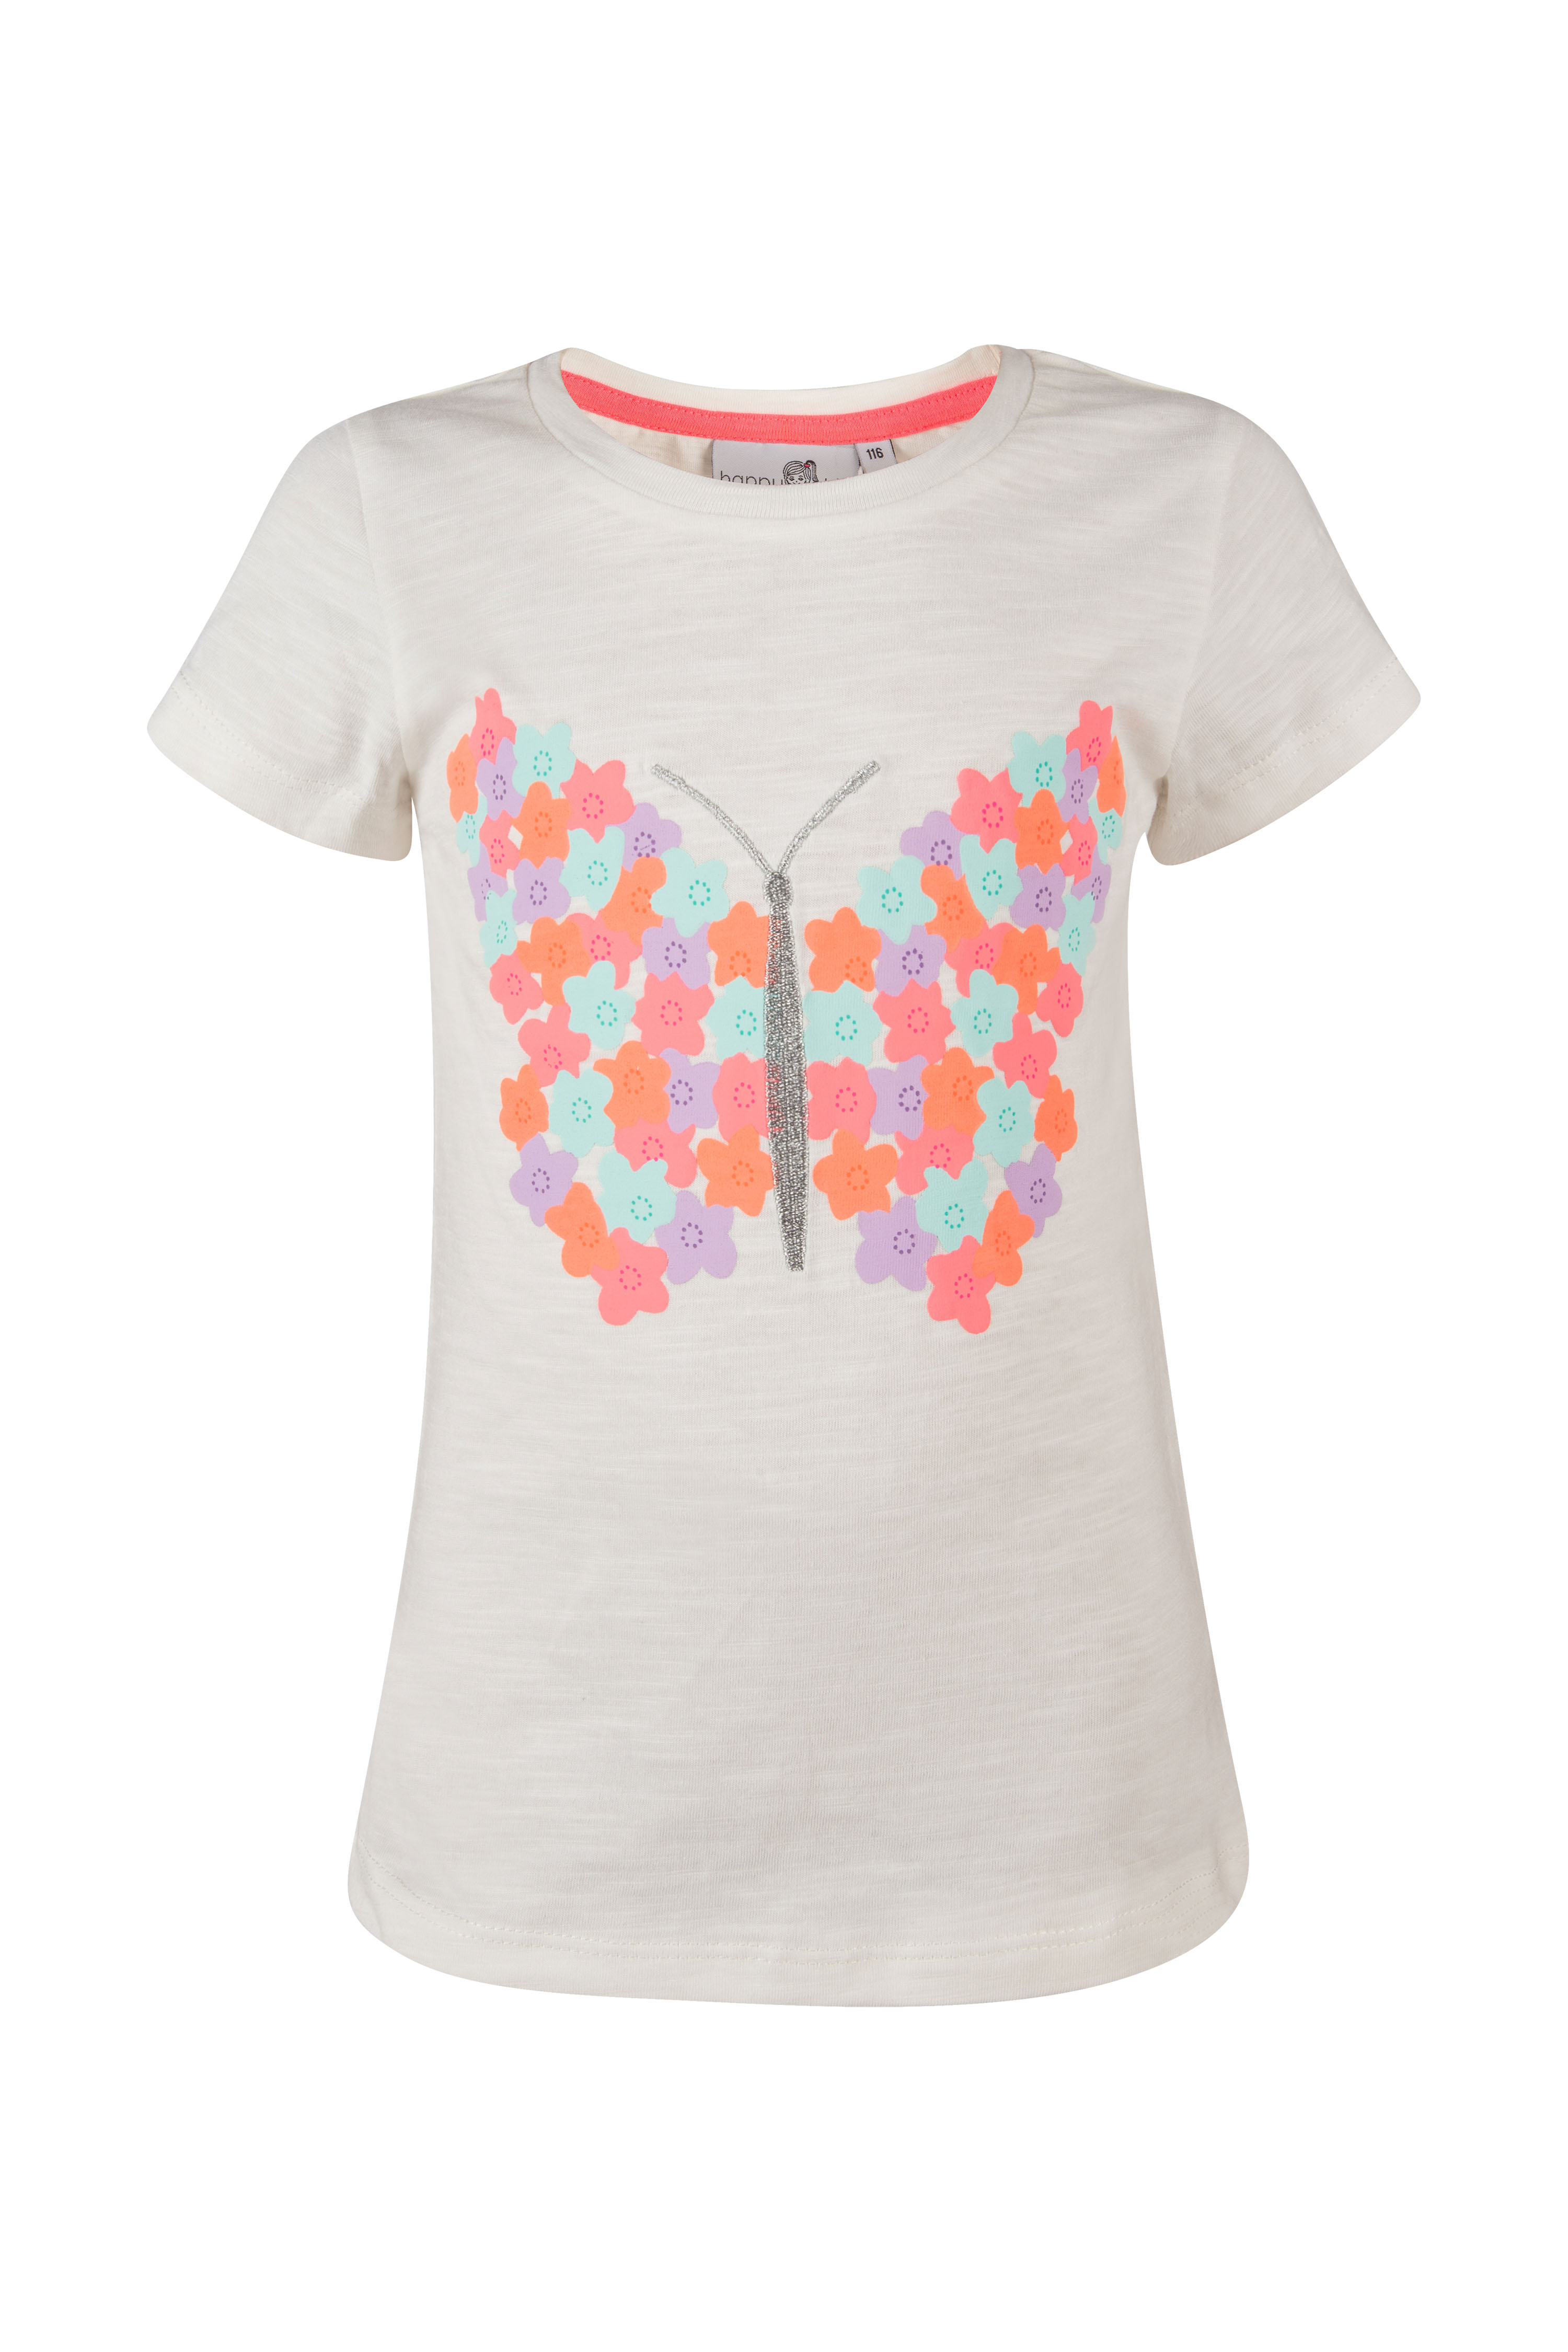 Shirt 122 neon pink happy girls by Eisend